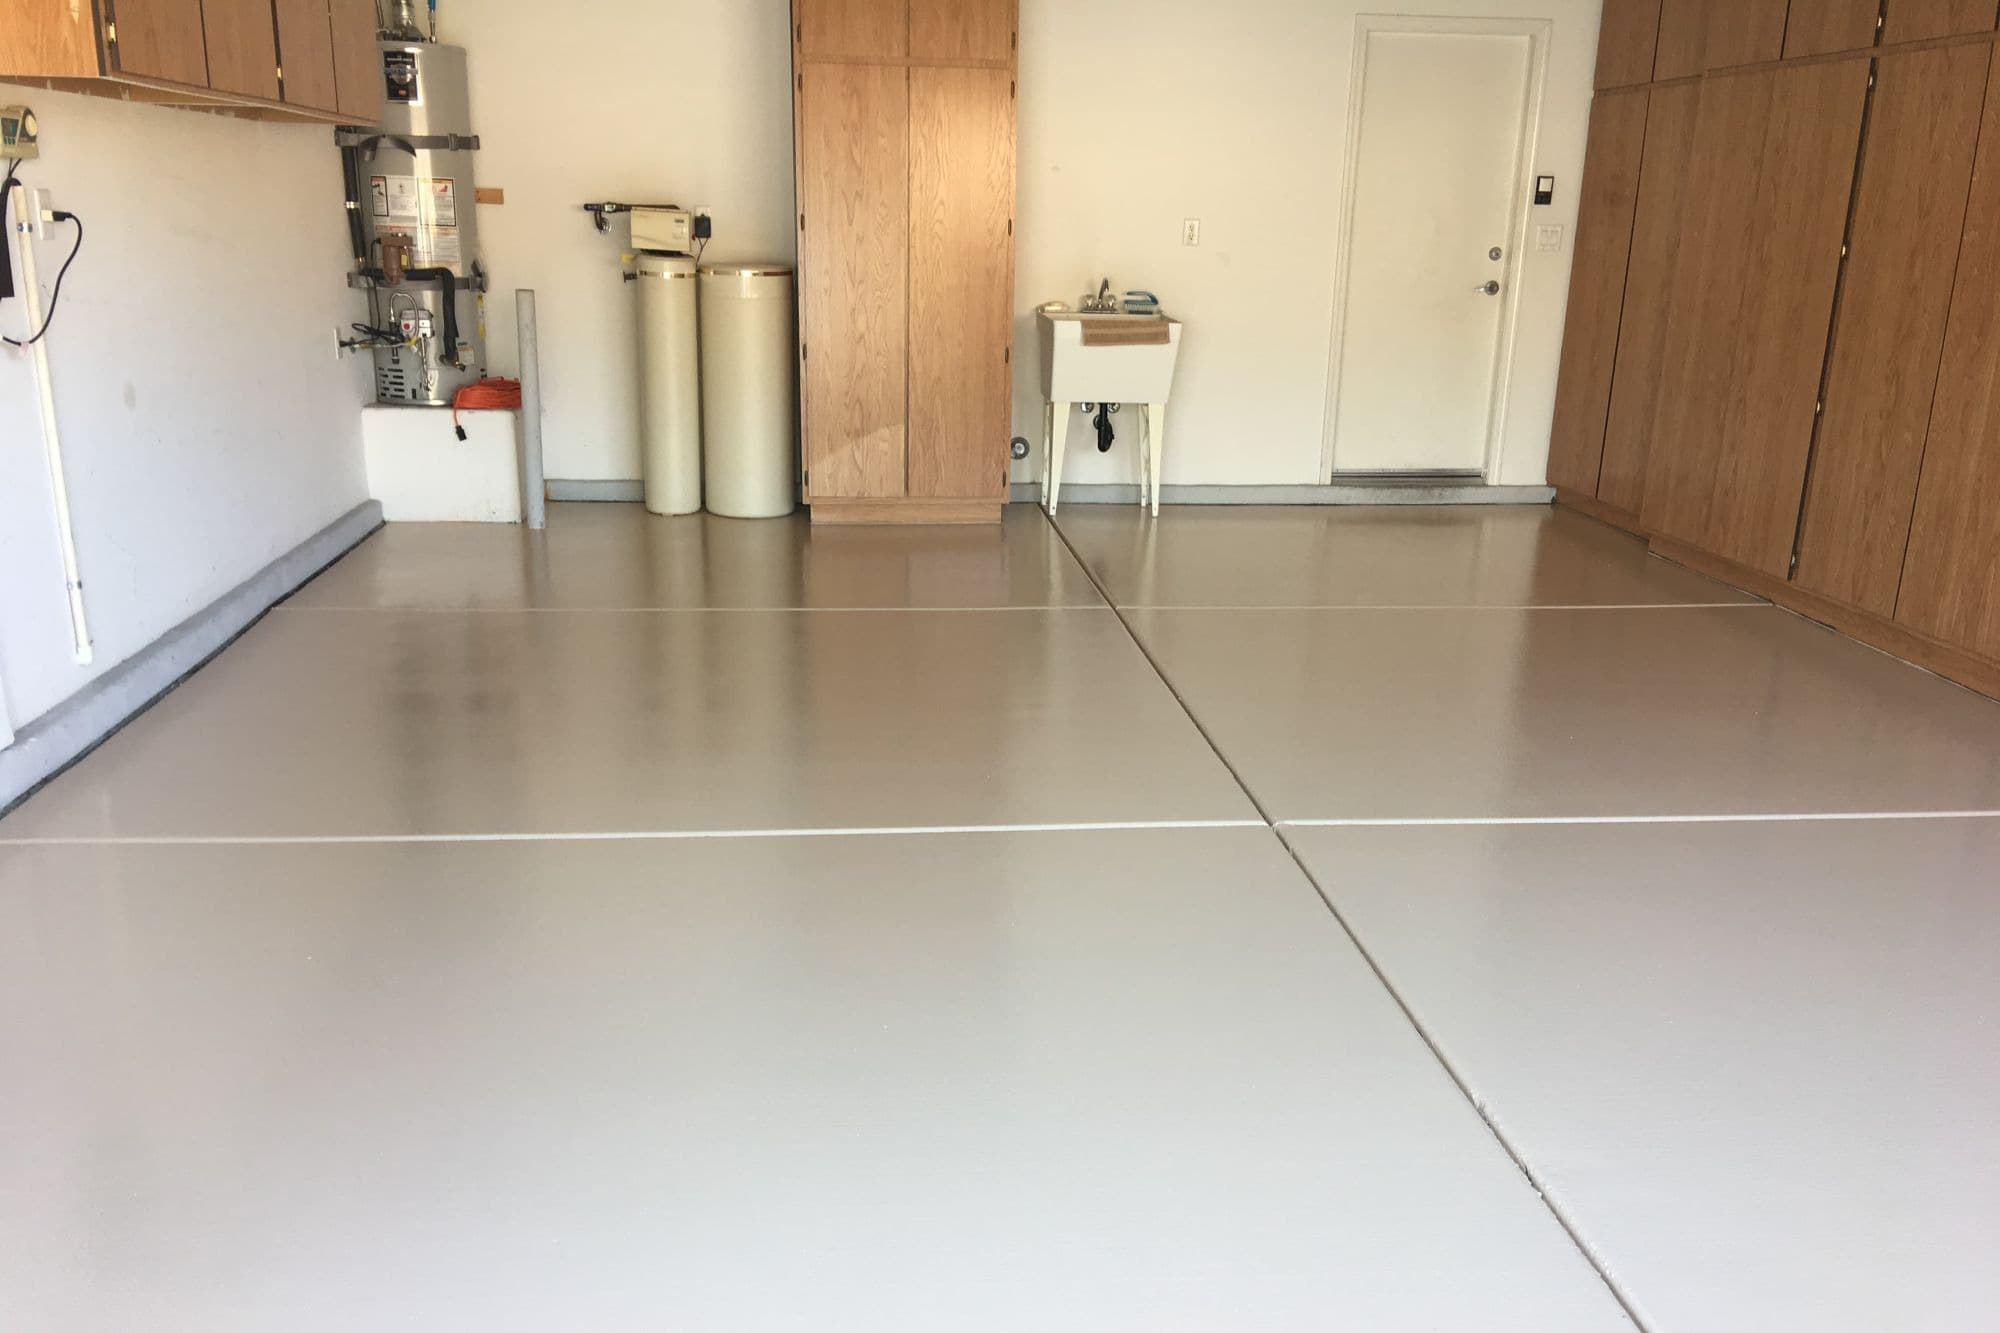 garage epoxy coating one solid color